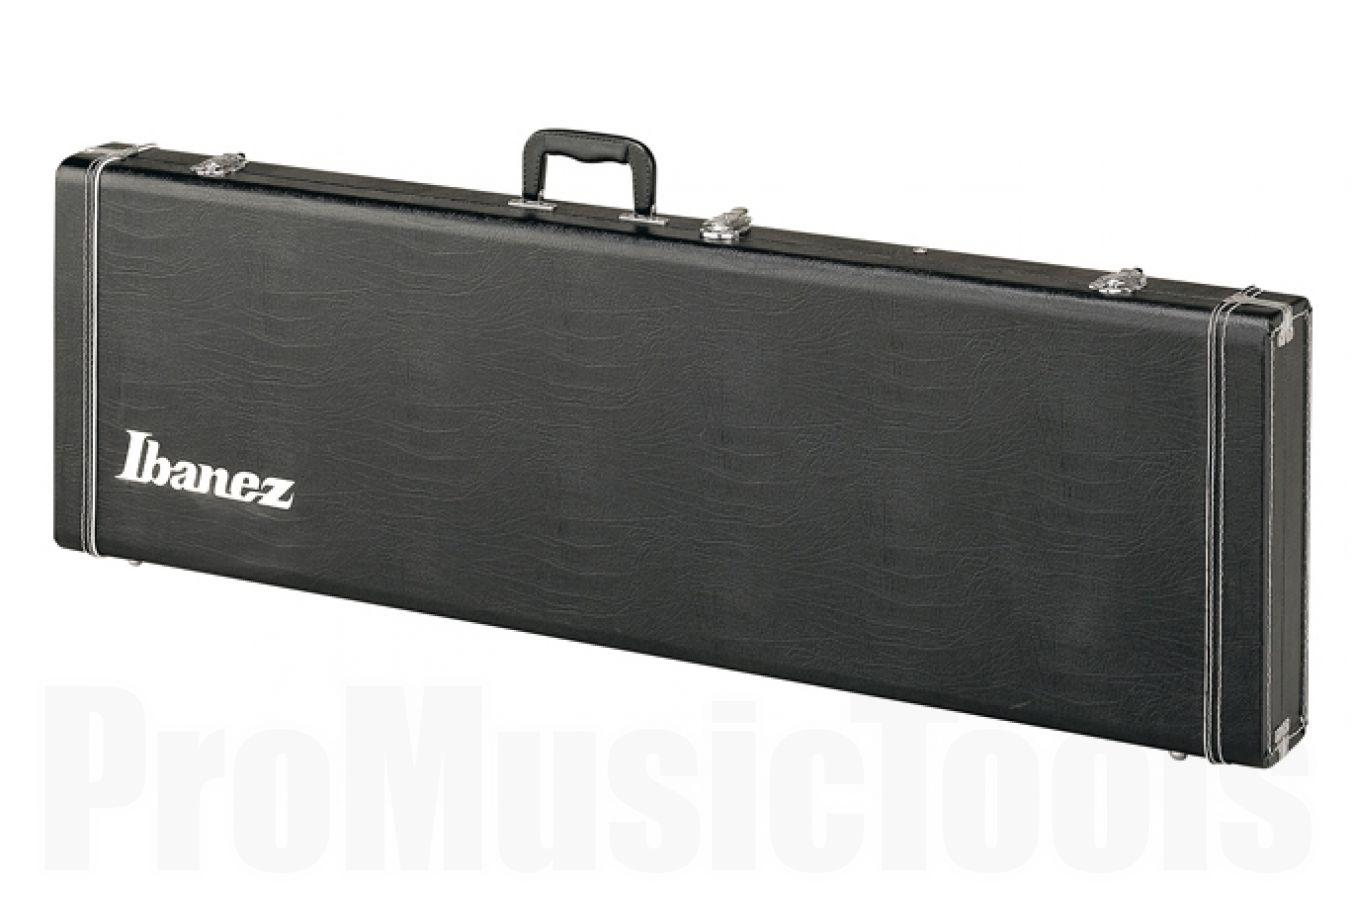 Ibanez W50DTN Wooden Case for Darkstone